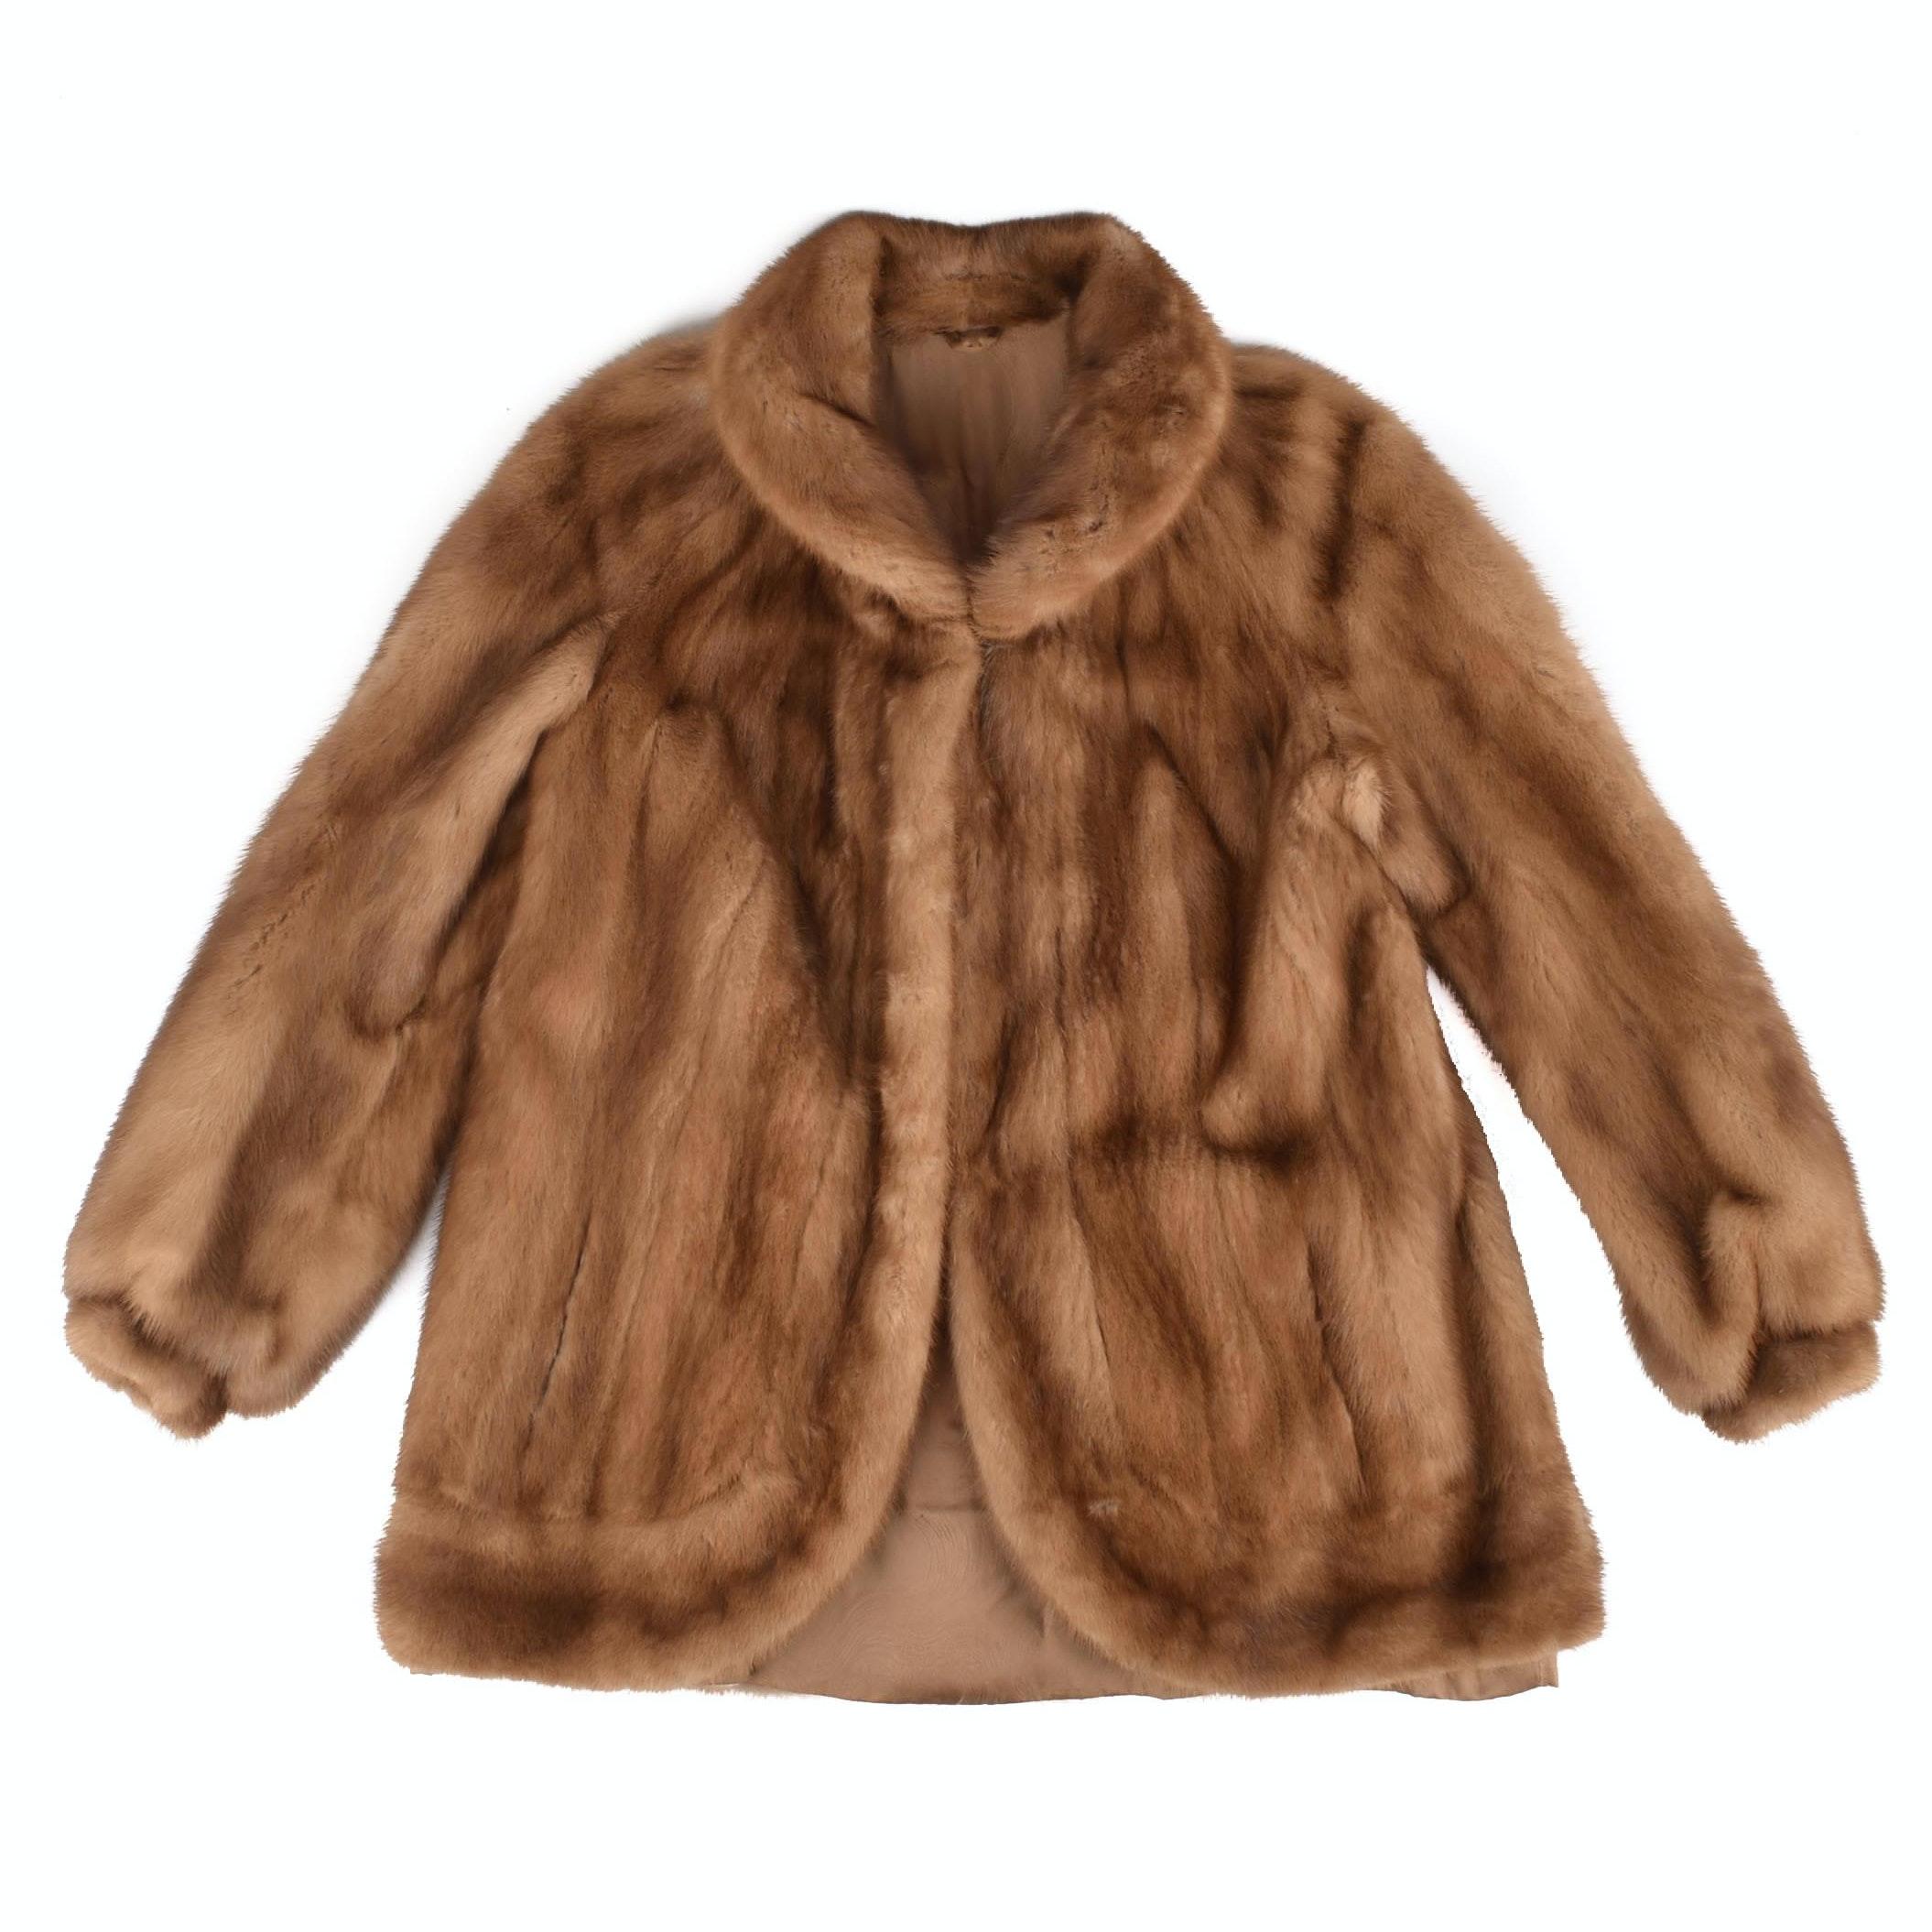 Vintage Pastel Mink Jacket